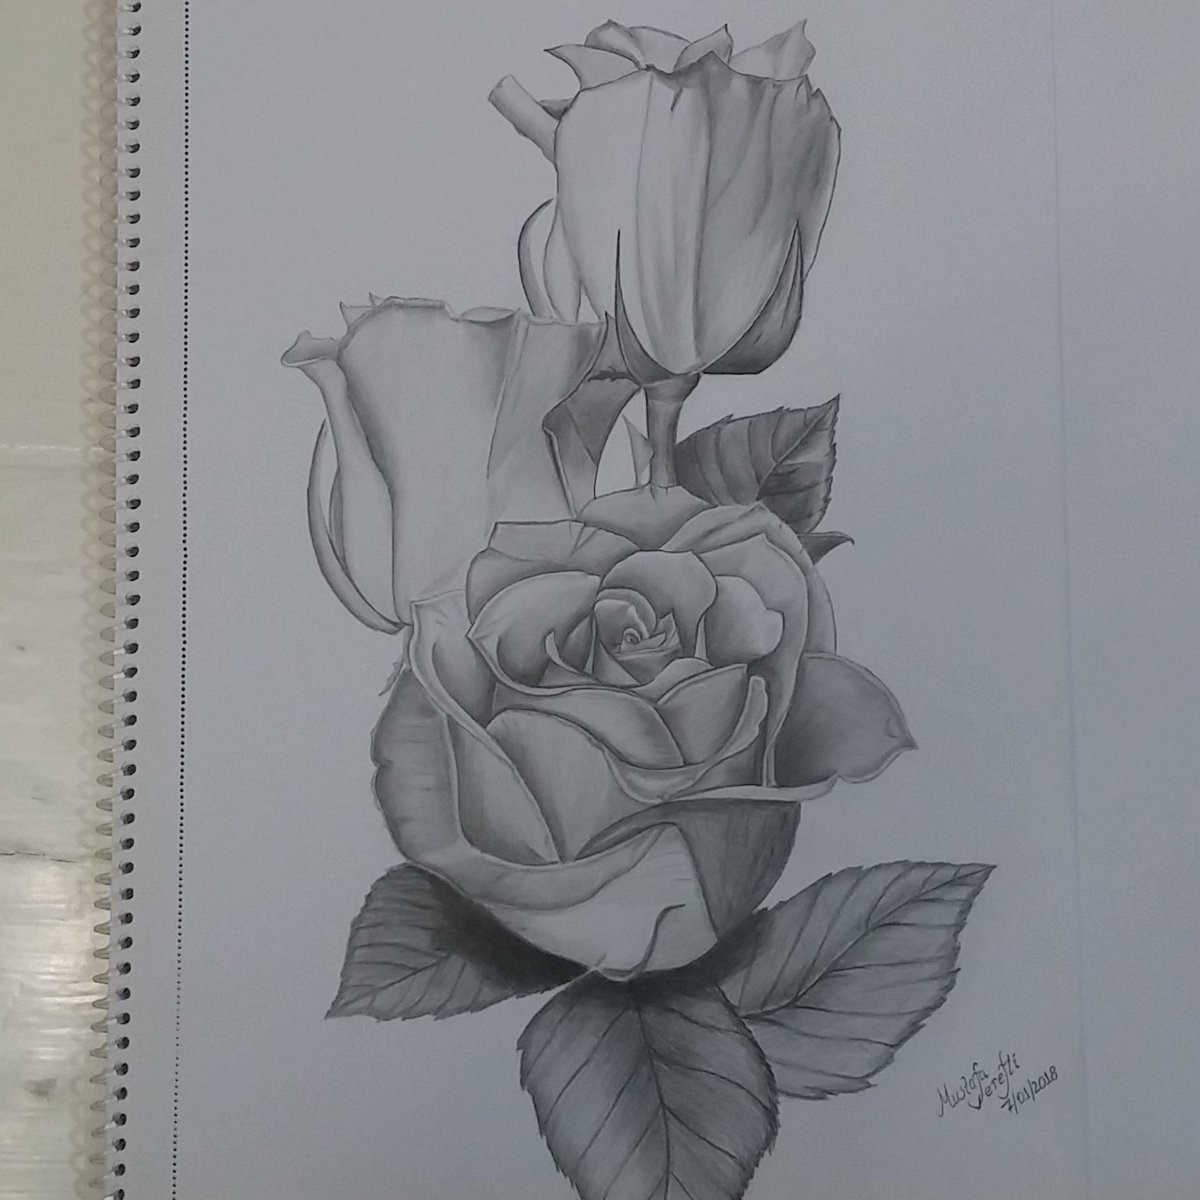 karakalem çizimleri 1